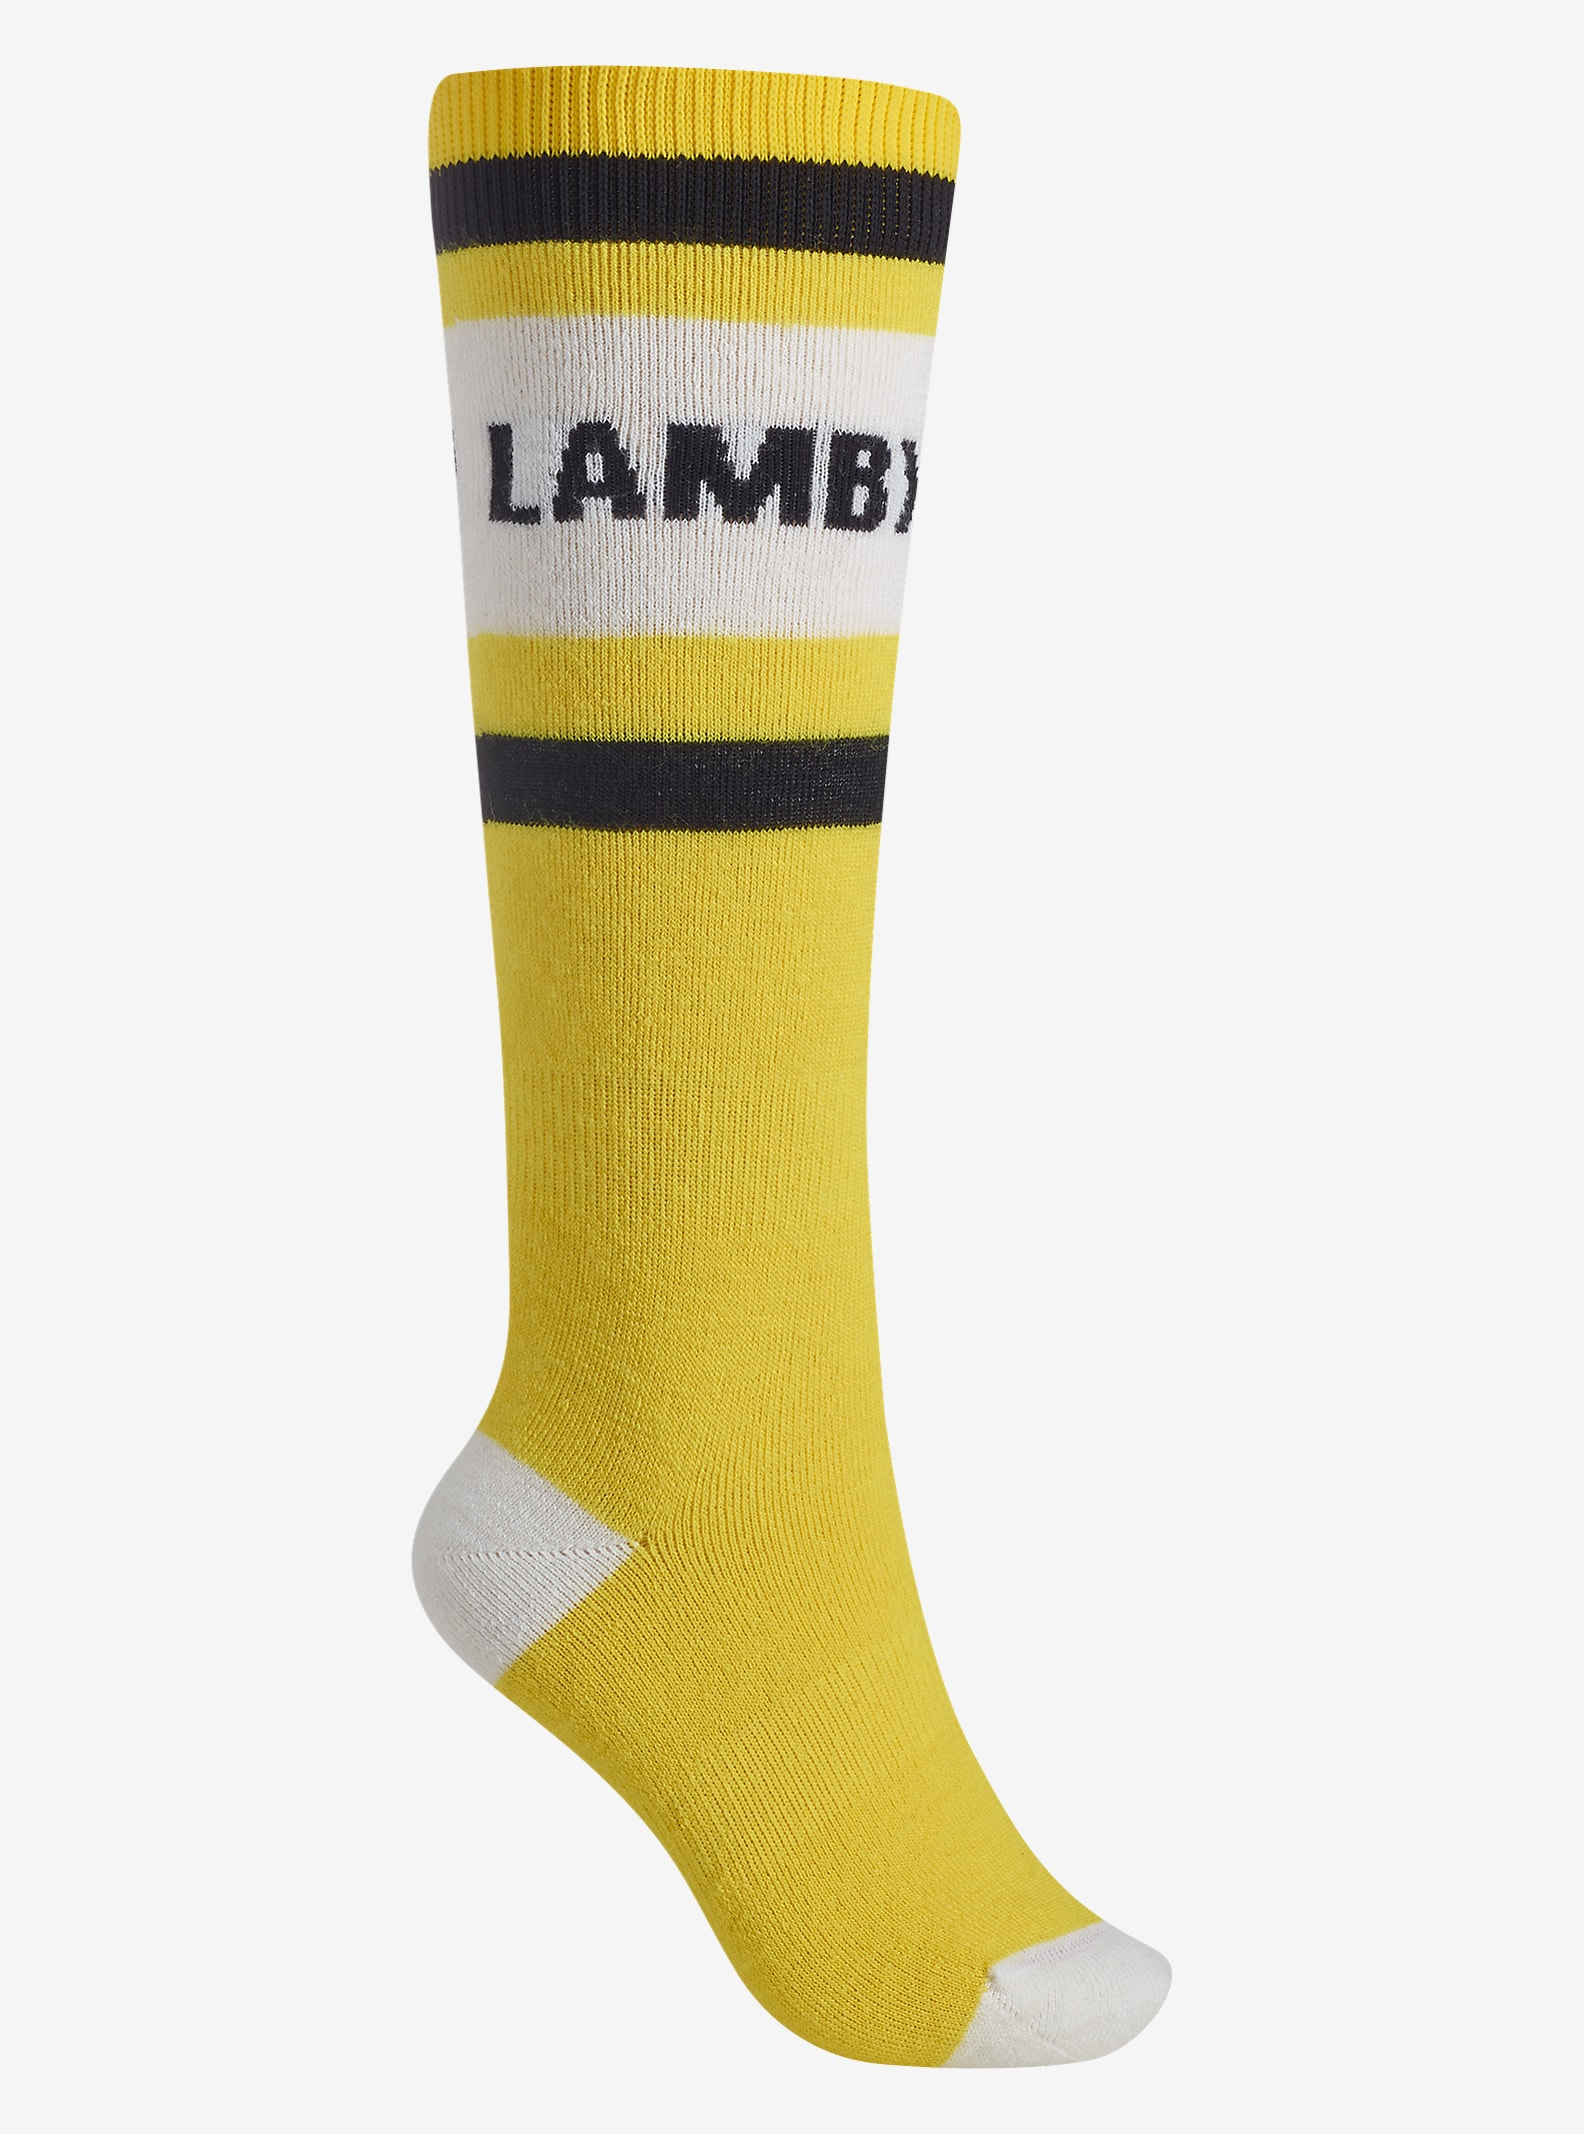 L.A.M.B. x Burton Party Sock shown in L.A.M.B.